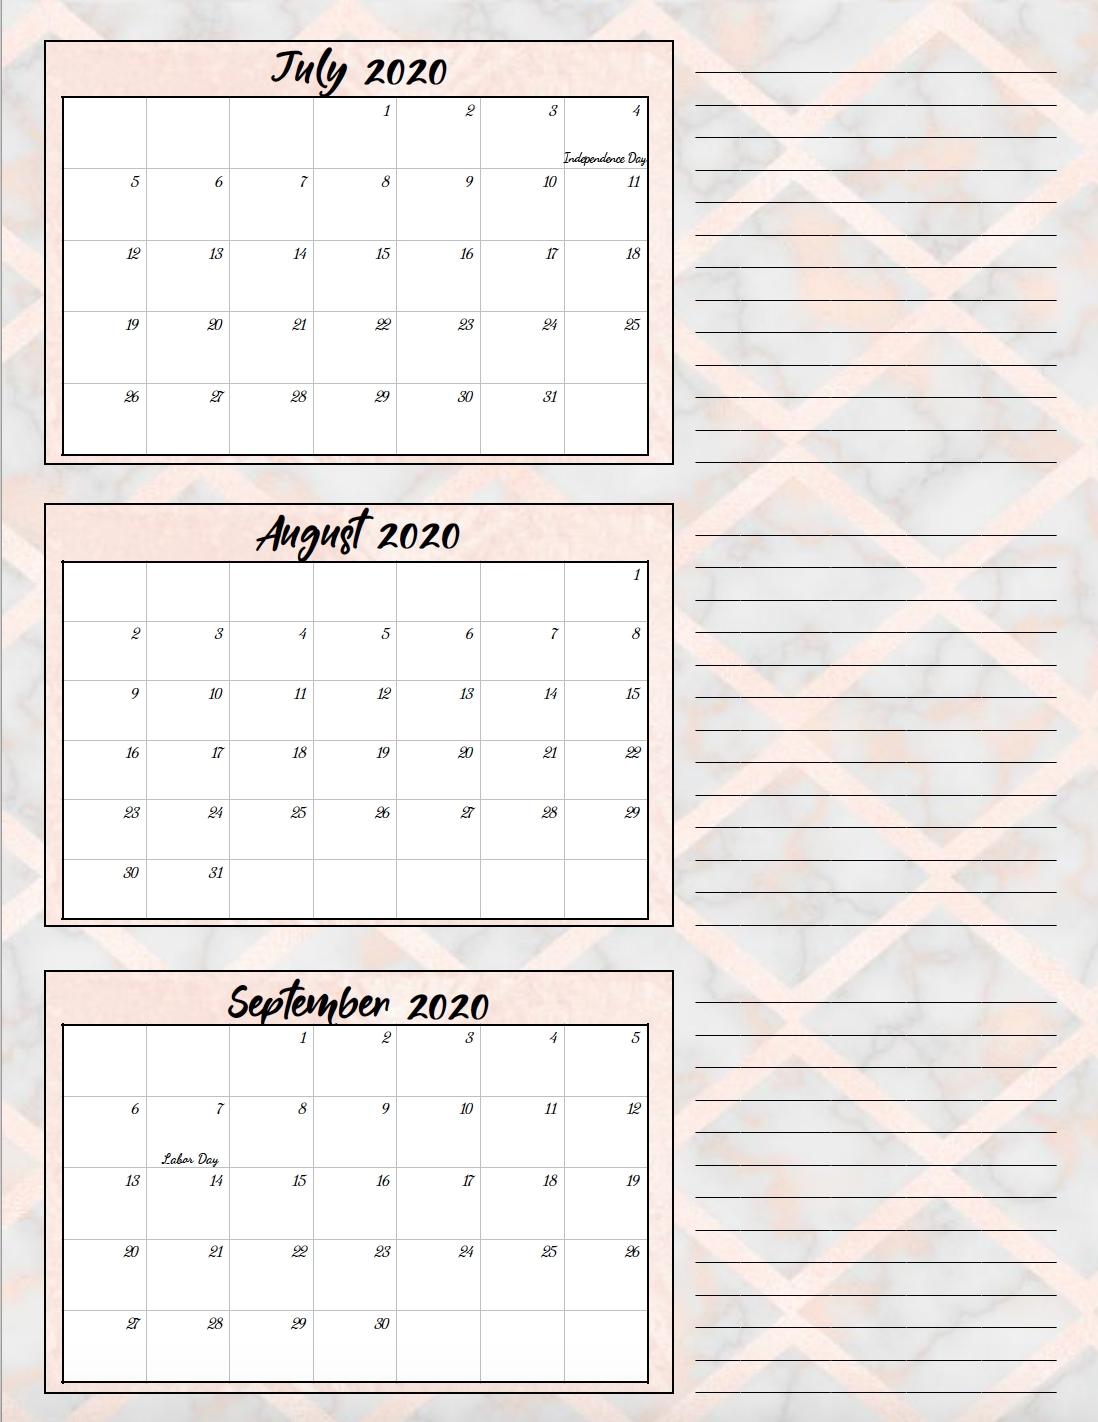 Free Printable 2020 Quarterly Calendars With Holidays: 3 inside Calendar For Quarterly 2020 Printable